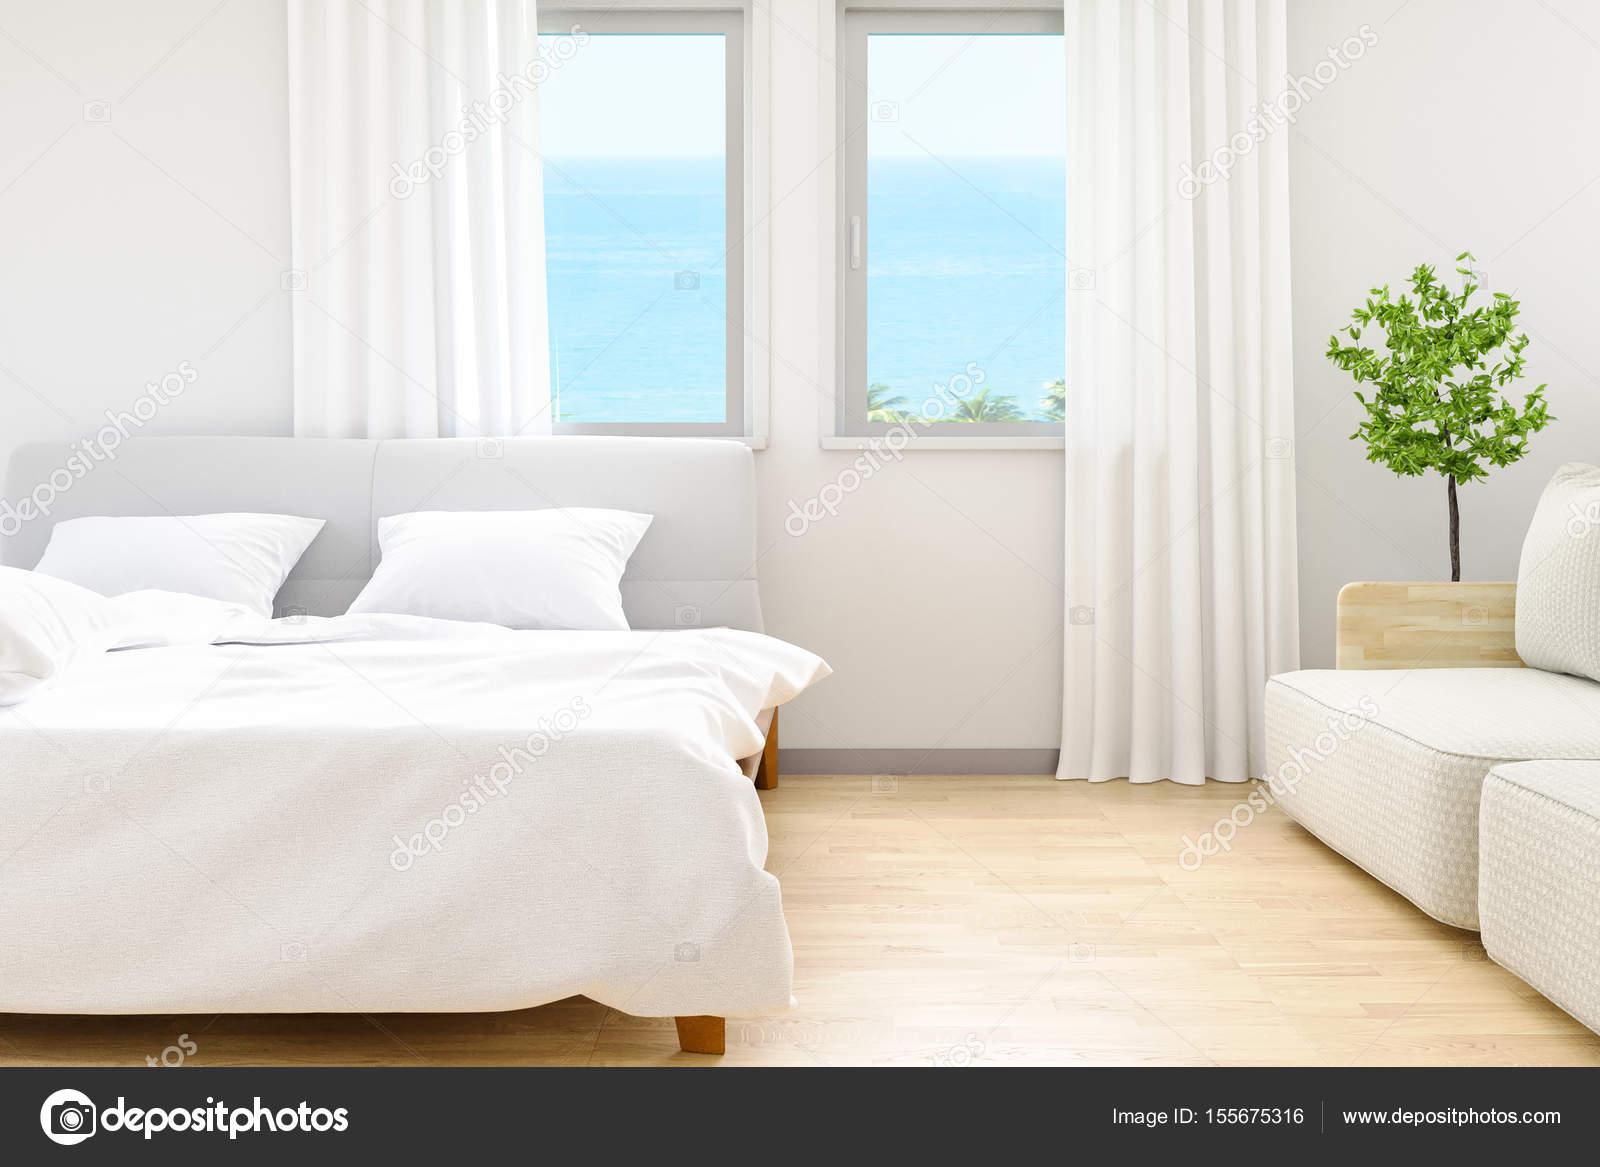 Moderne Witte Slaapkamer : De moderne witte slaapkamer lakens en kussens comfort en